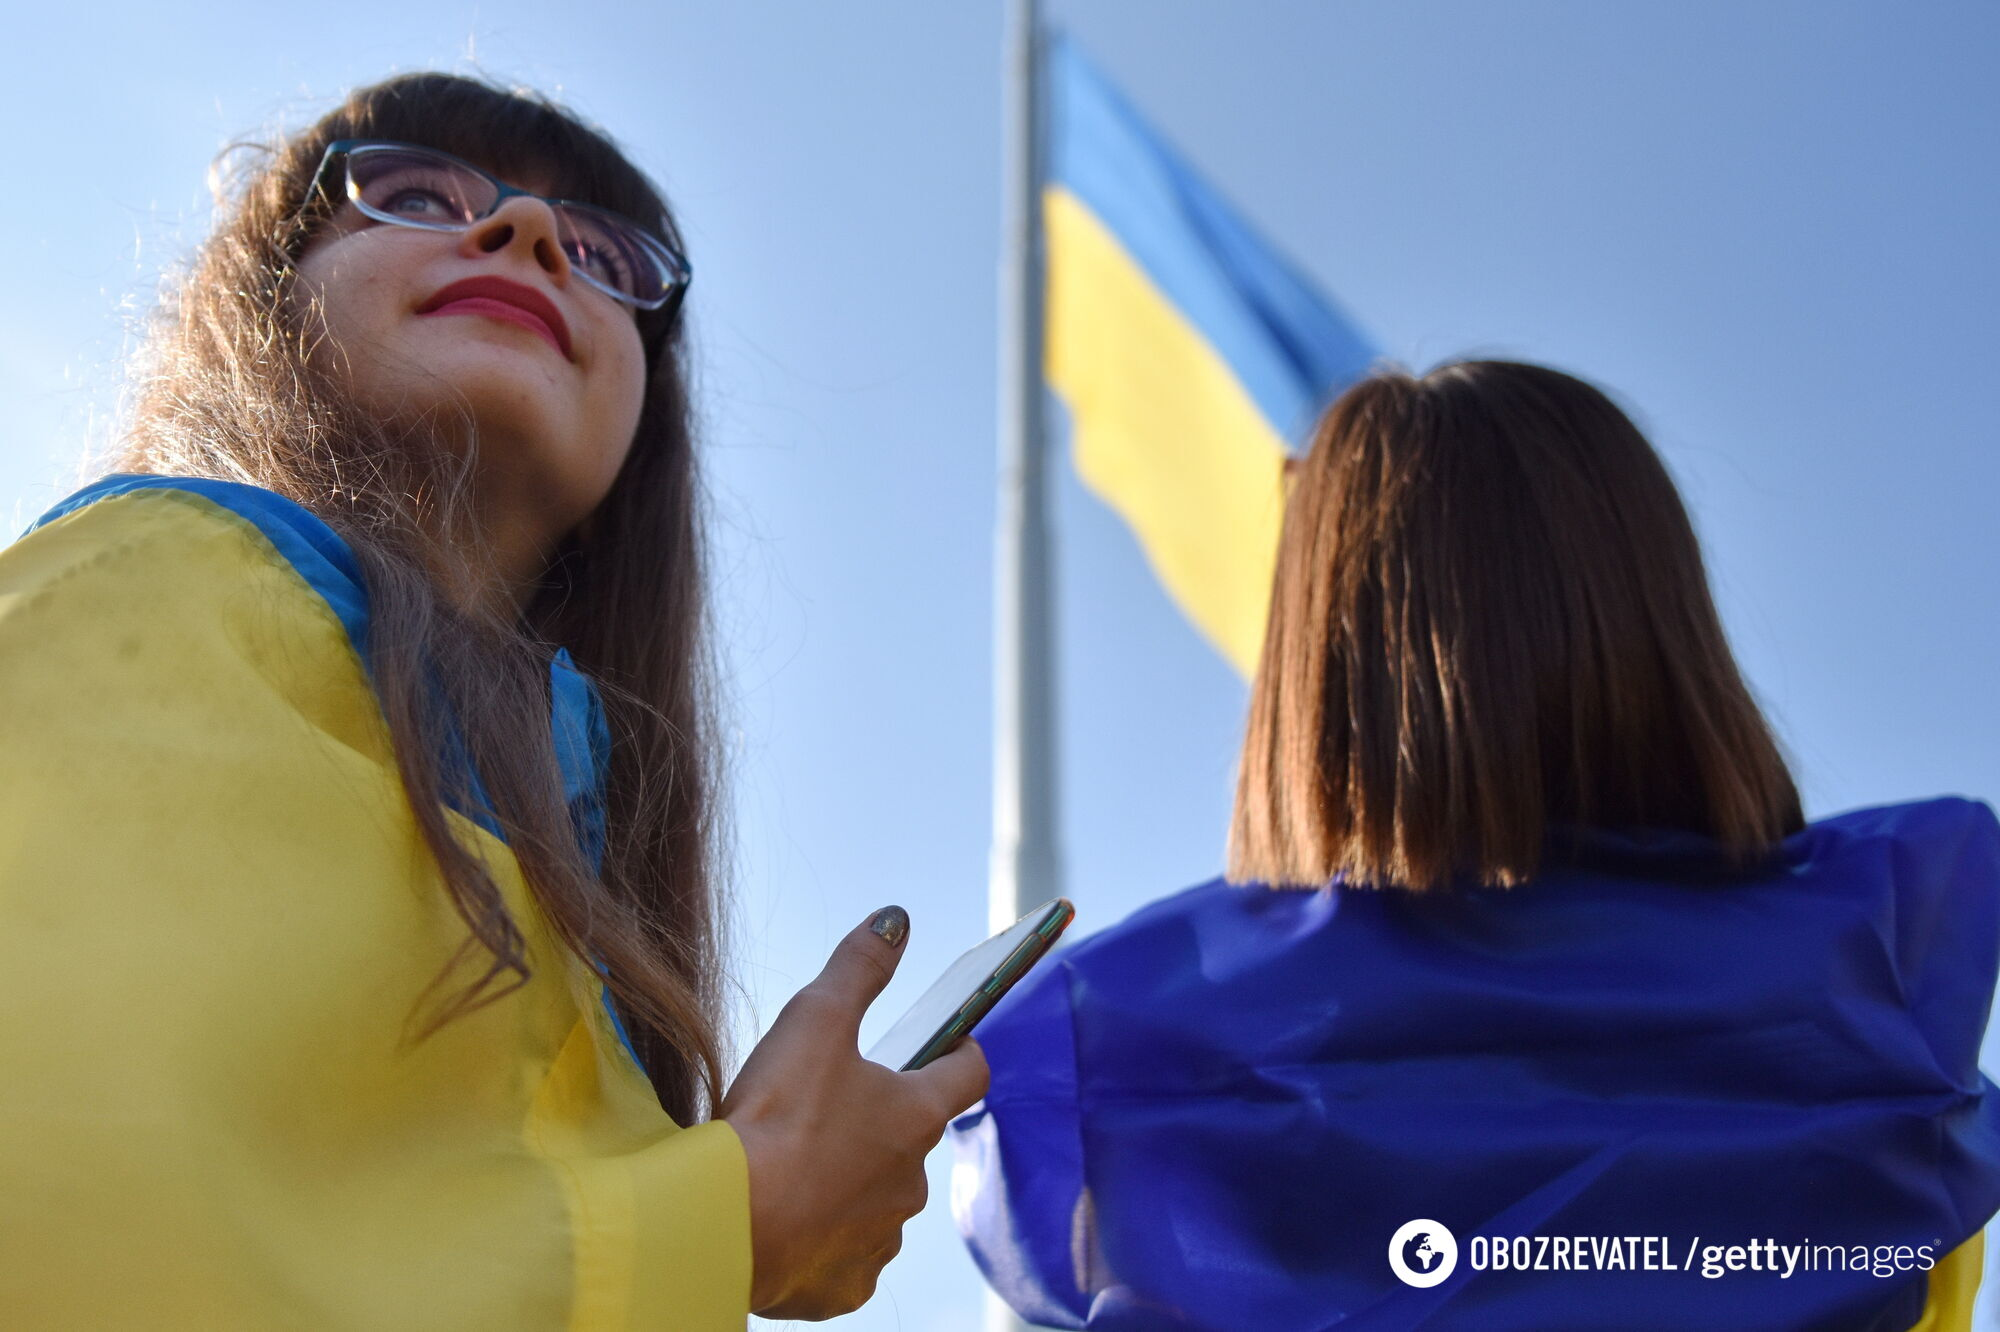 Украинки во время празднования Дня Независимости